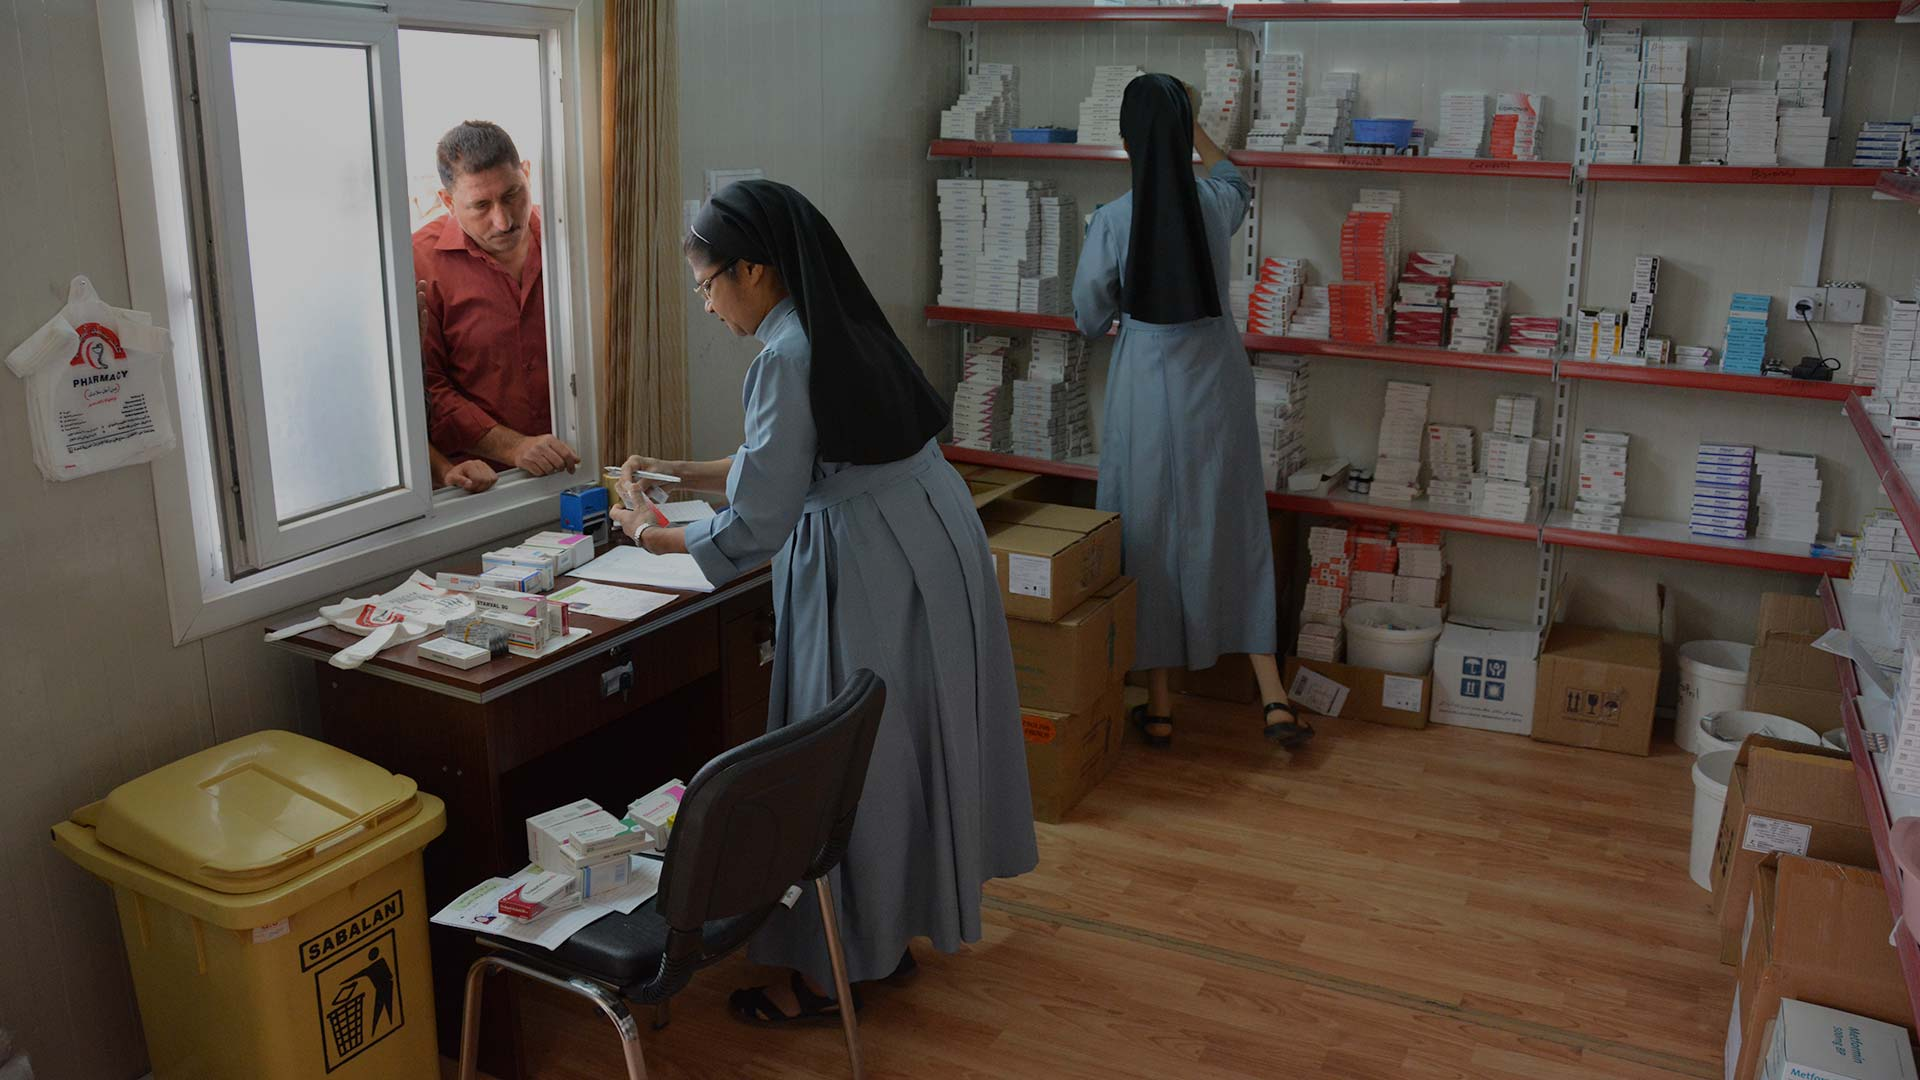 Iraq: Saint Joseph's – the clinic with open doors